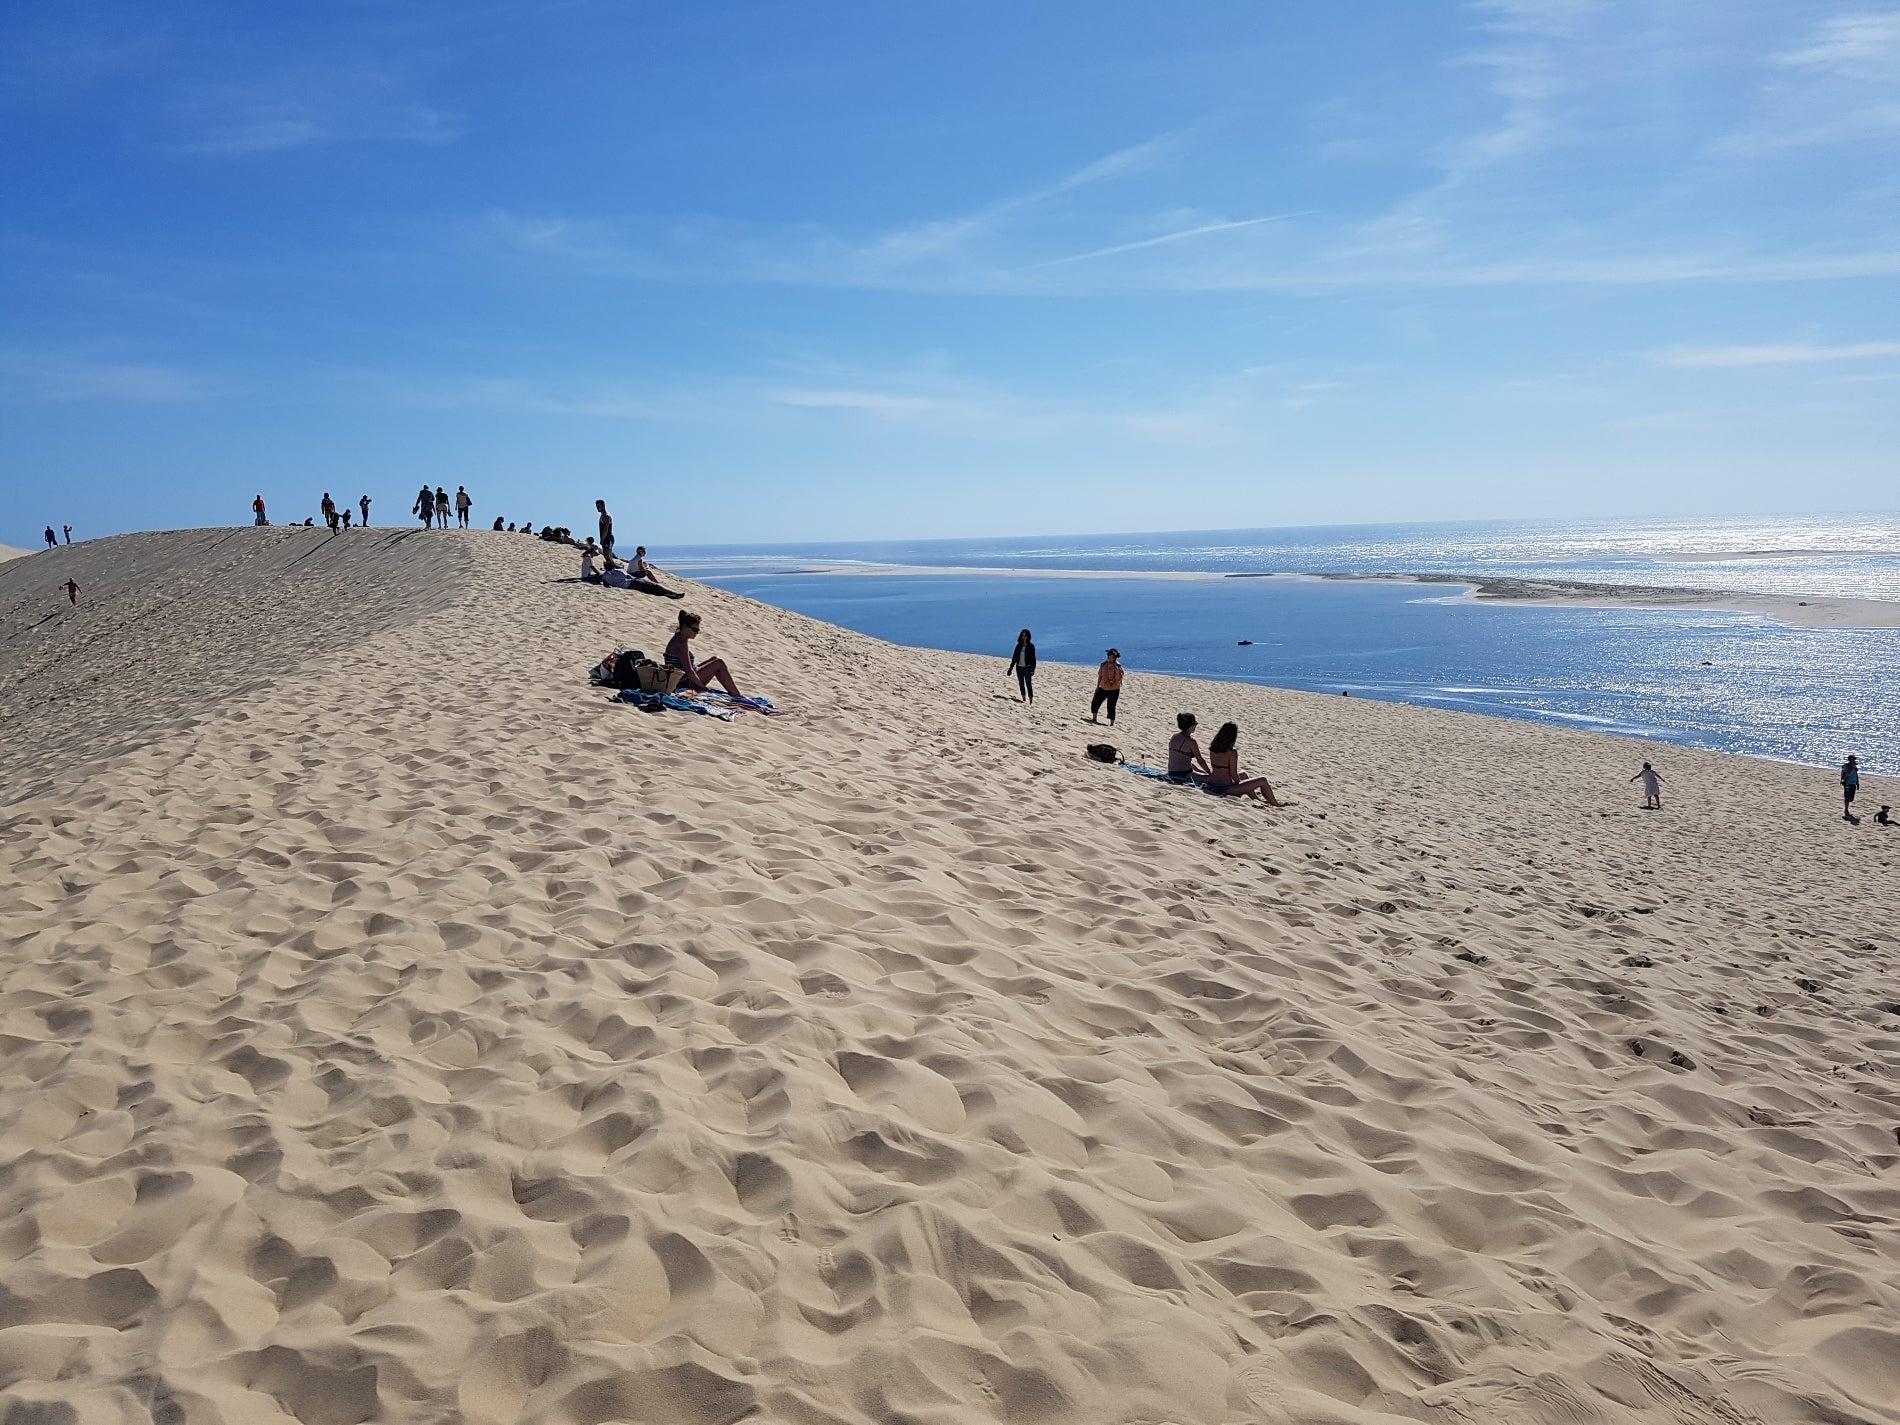 Dune of Pilat (La Dune du Pilat)